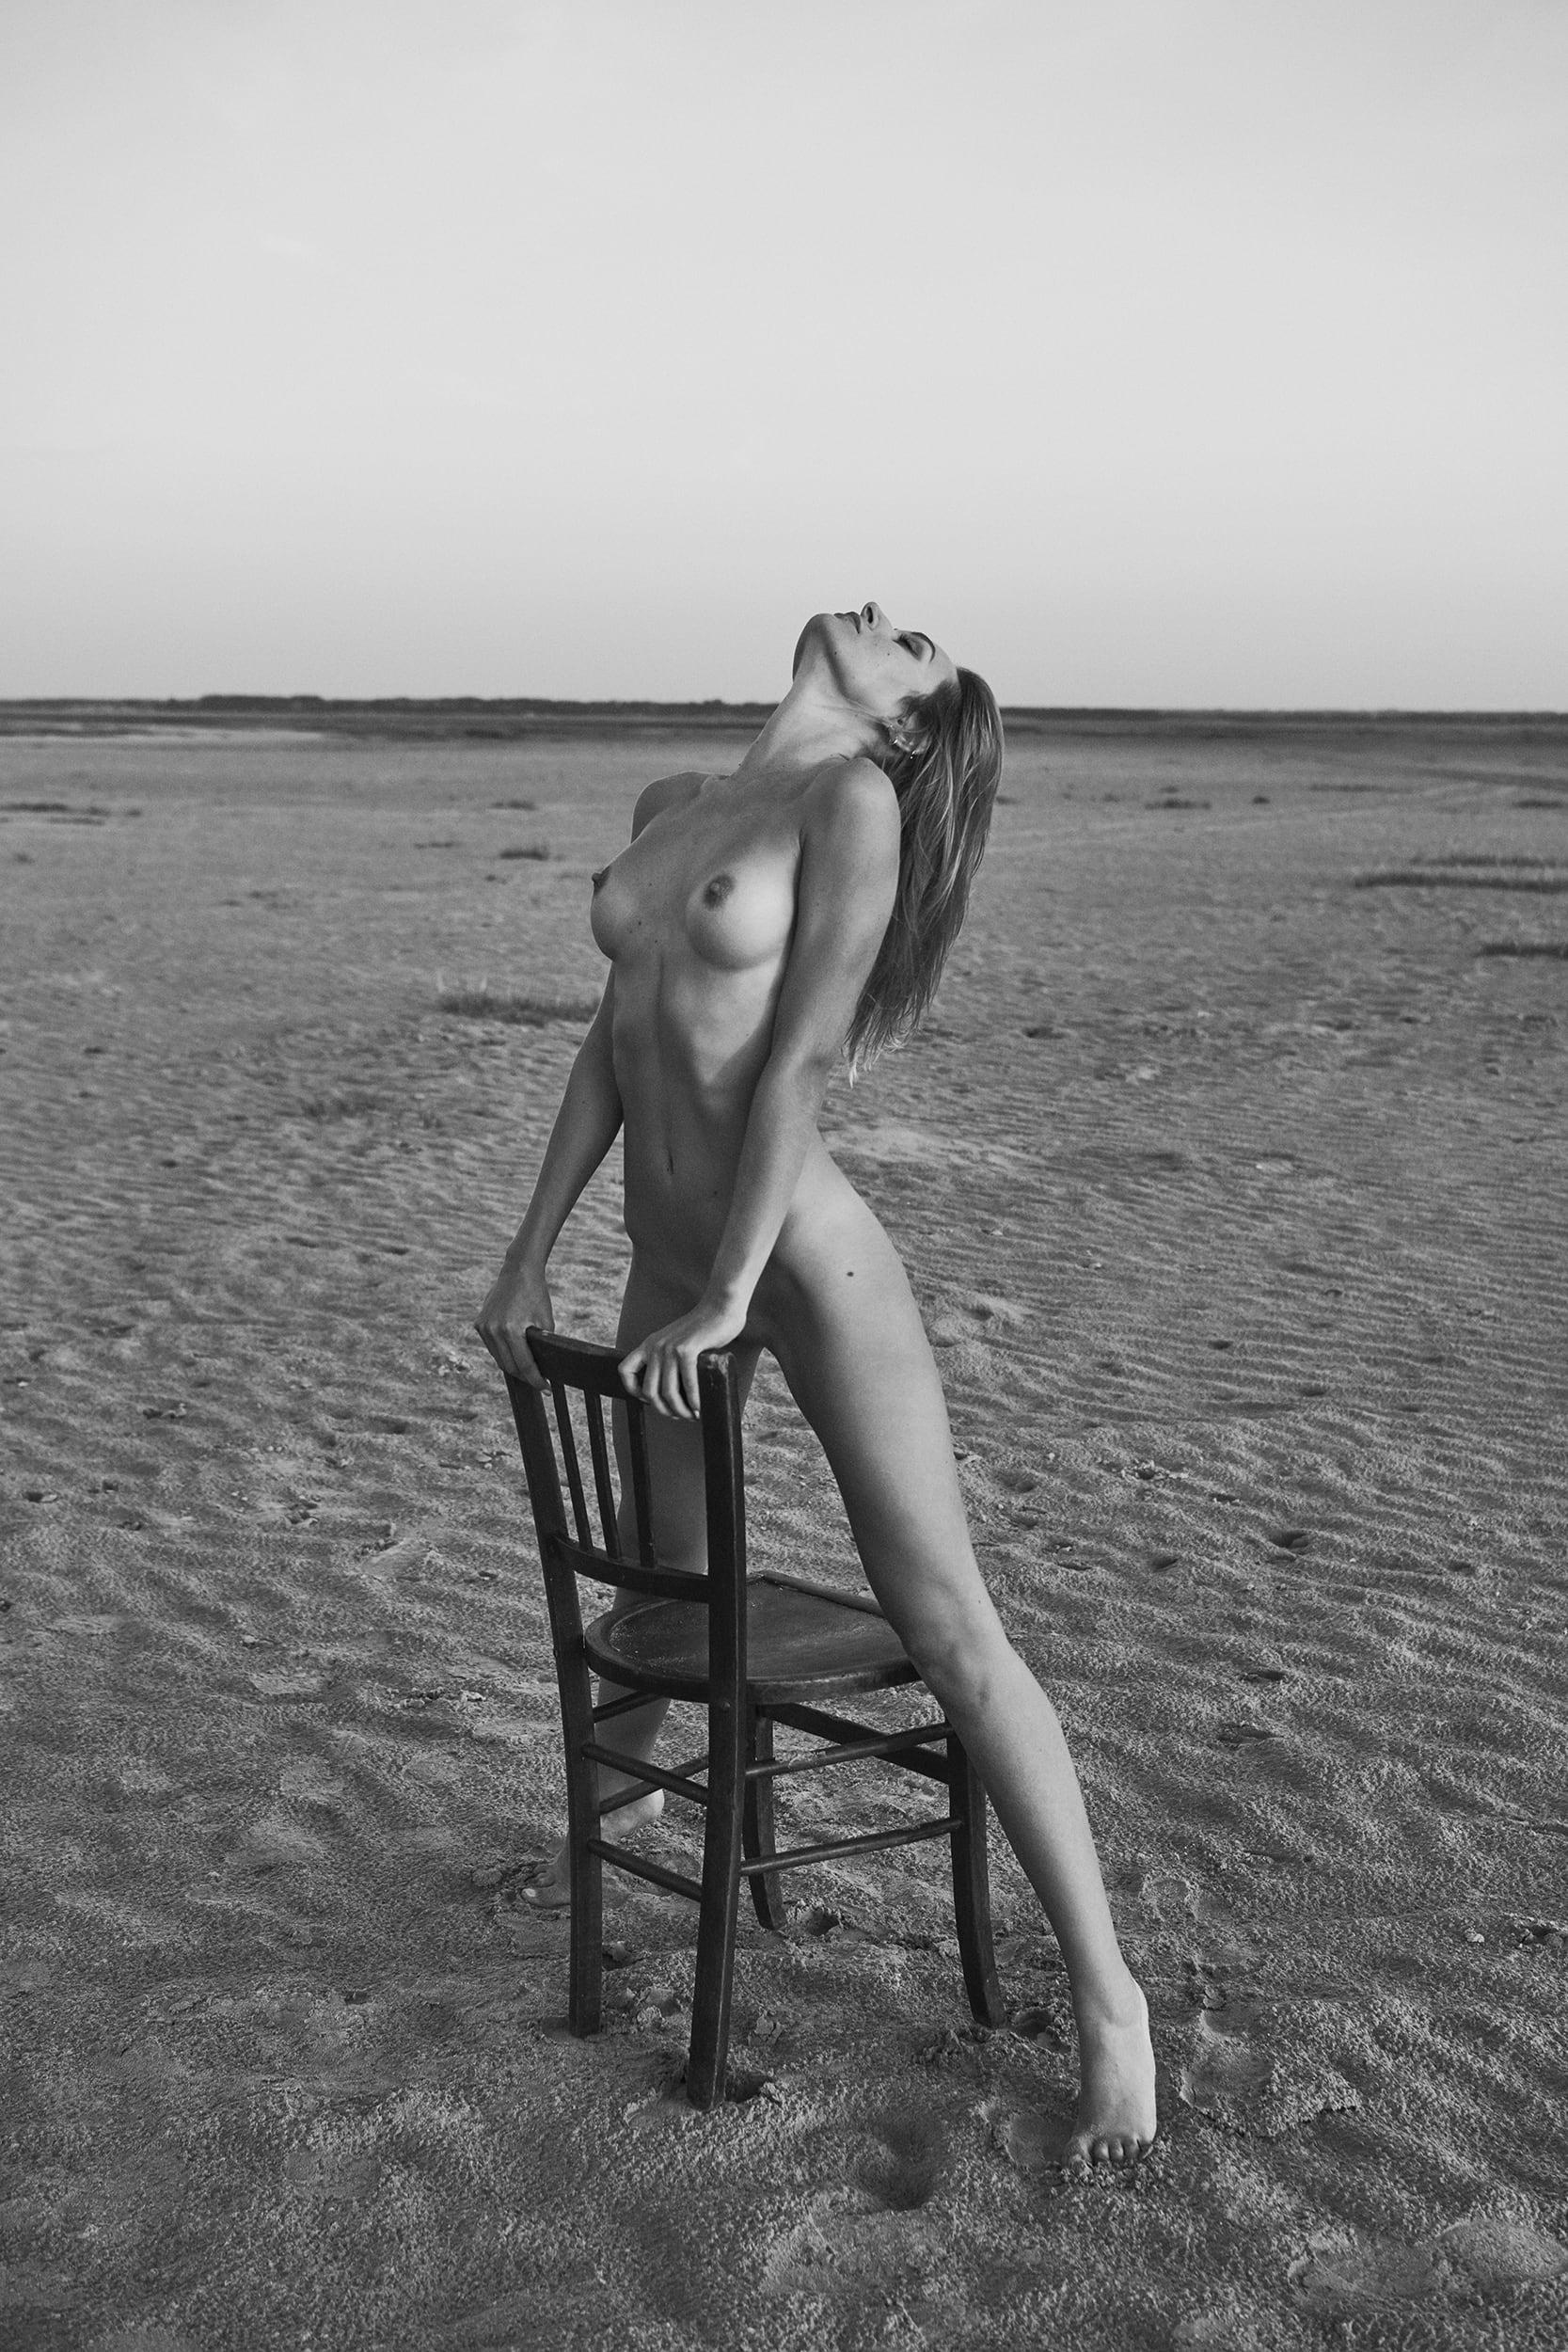 Justine Nikolaiev by Stefan Rappo